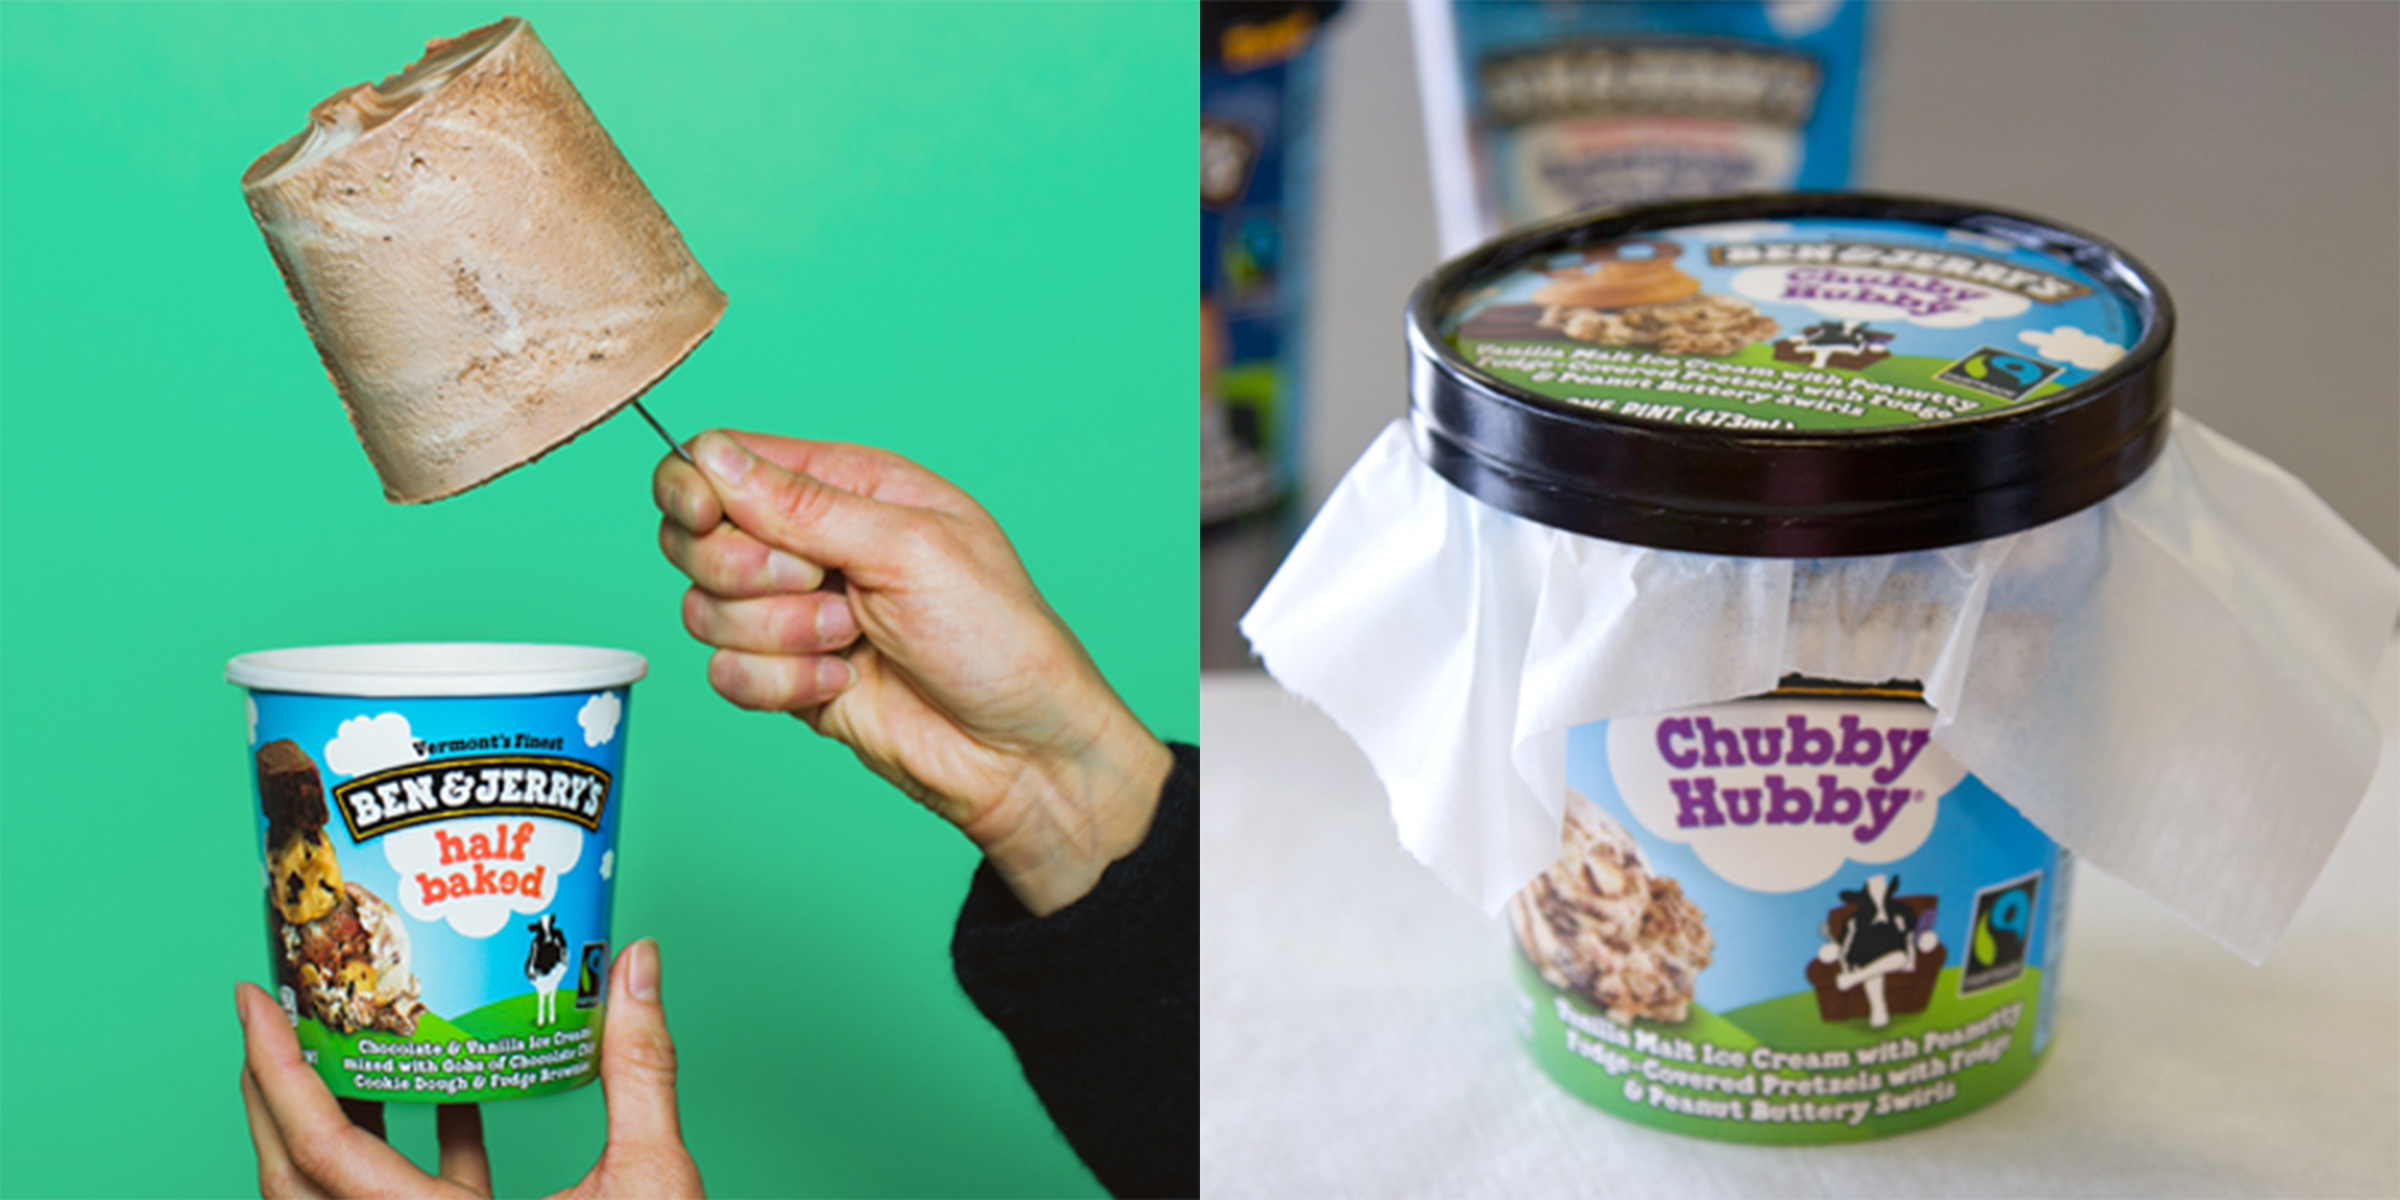 5 tricks to prevent freezer burnt ice cream, according to the experts